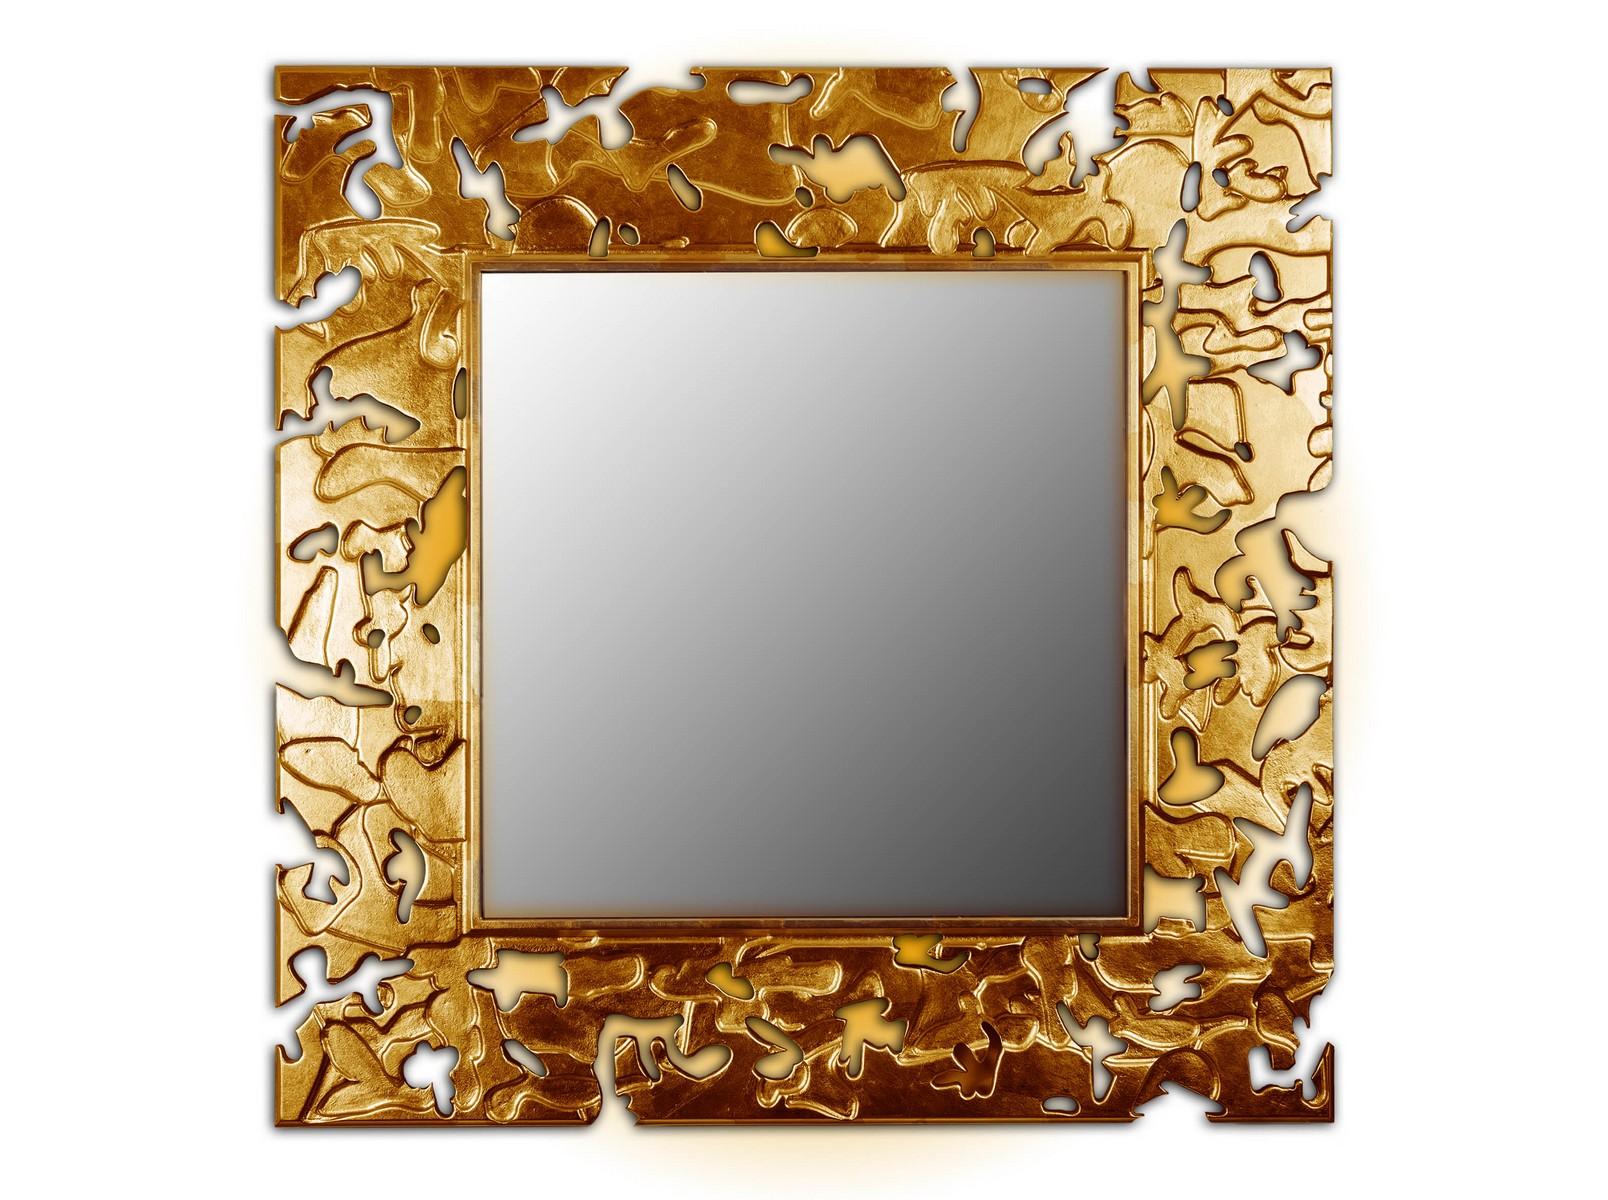 Зеркало CAMOUFLAGEНастенные зеркала<br>Данный вариант представлен в квадратной форме, цвет: бронза<br><br>Material: Дерево<br>Width см: 90<br>Depth см: 0,8<br>Height см: 90